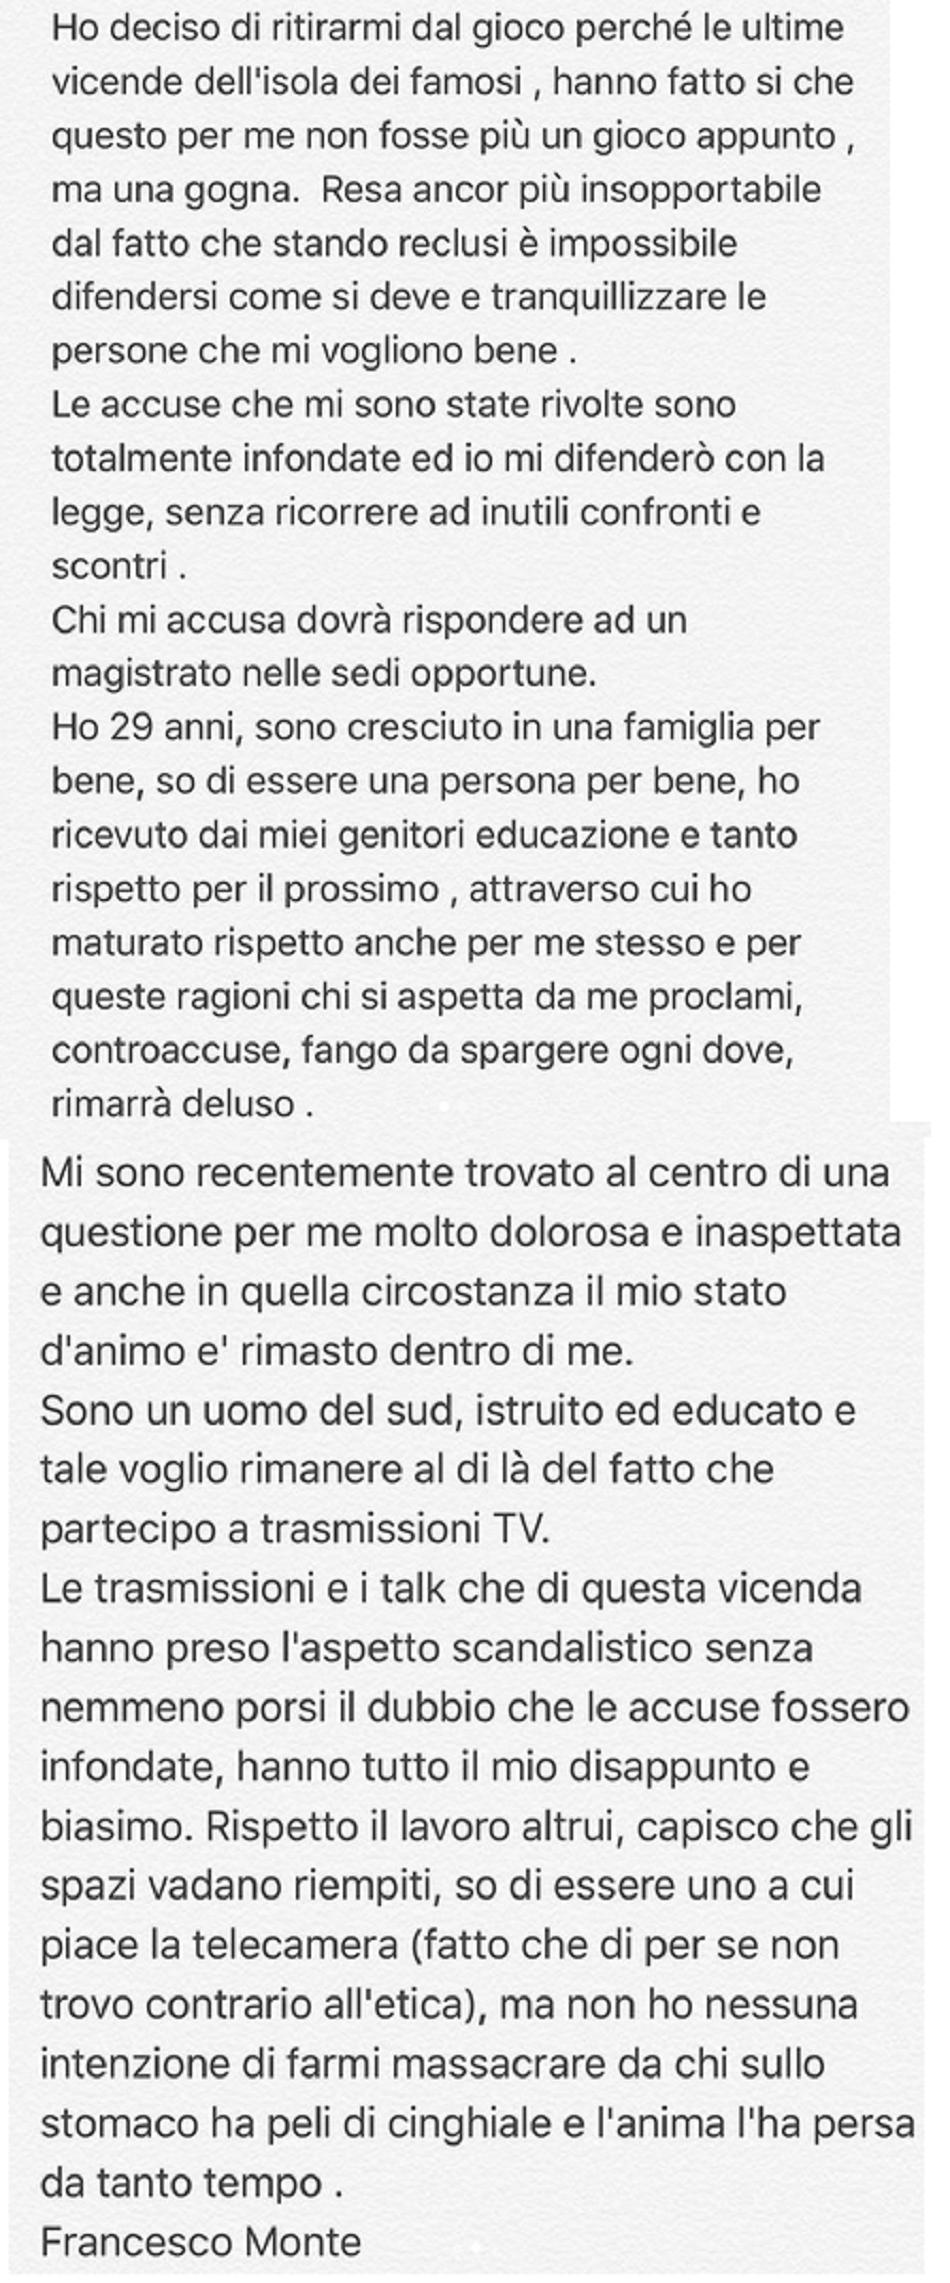 francesco monte1